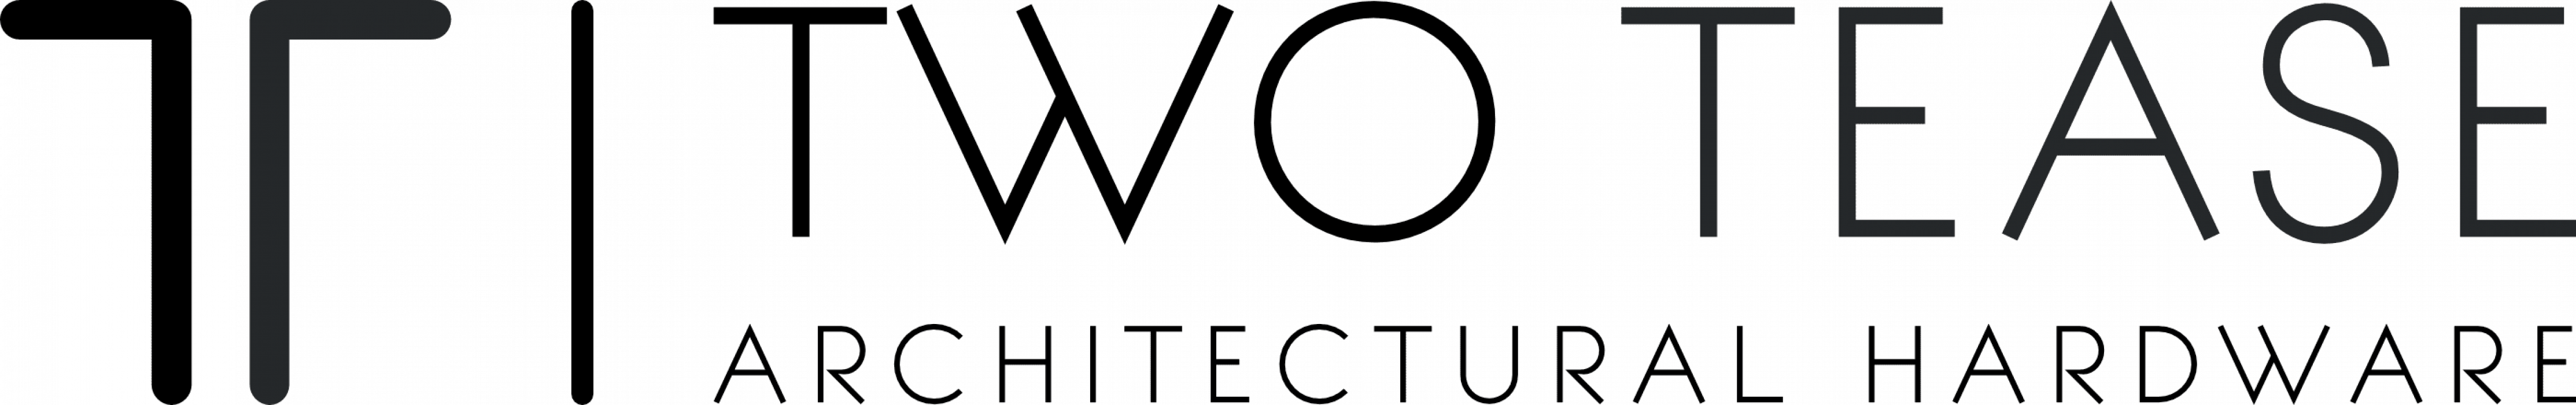 logo_high_resolution